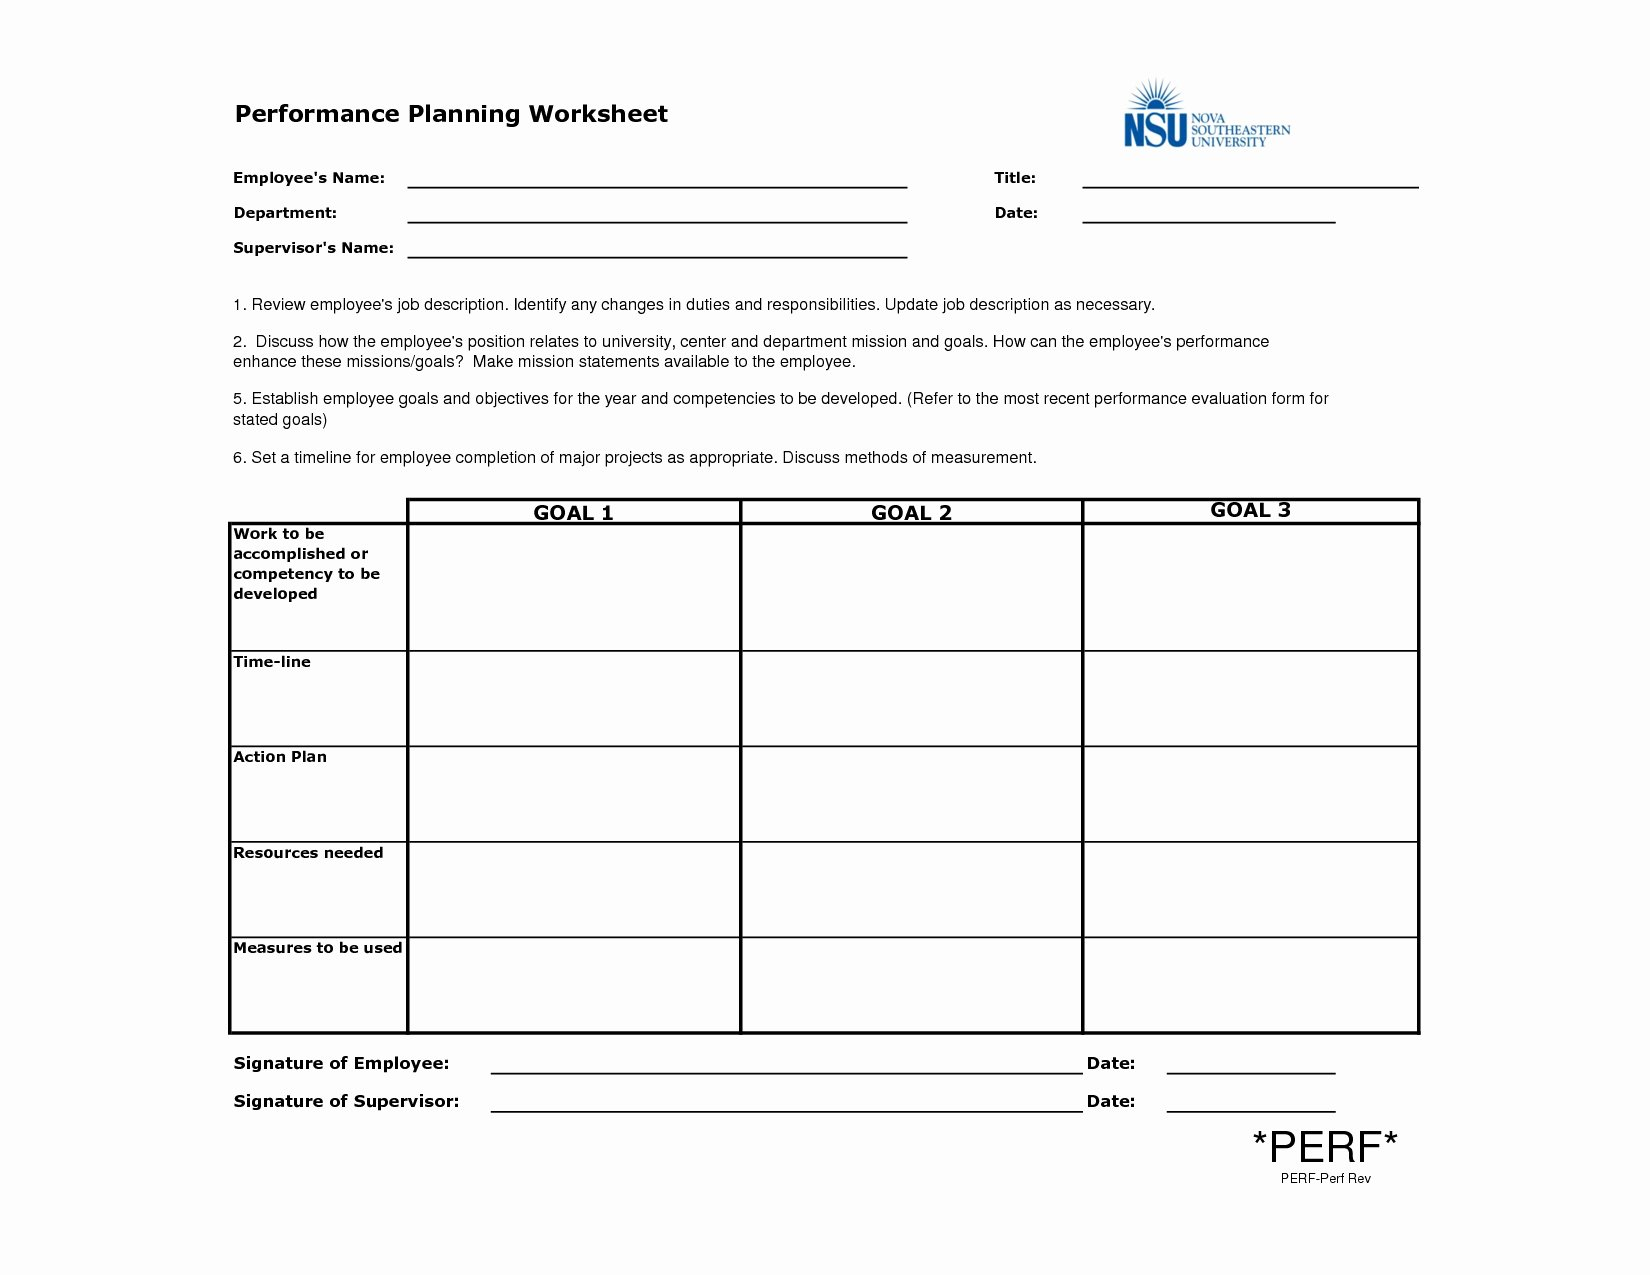 Performance Improvement Plan Template New Performance Improvement Plan Letter Template Examples